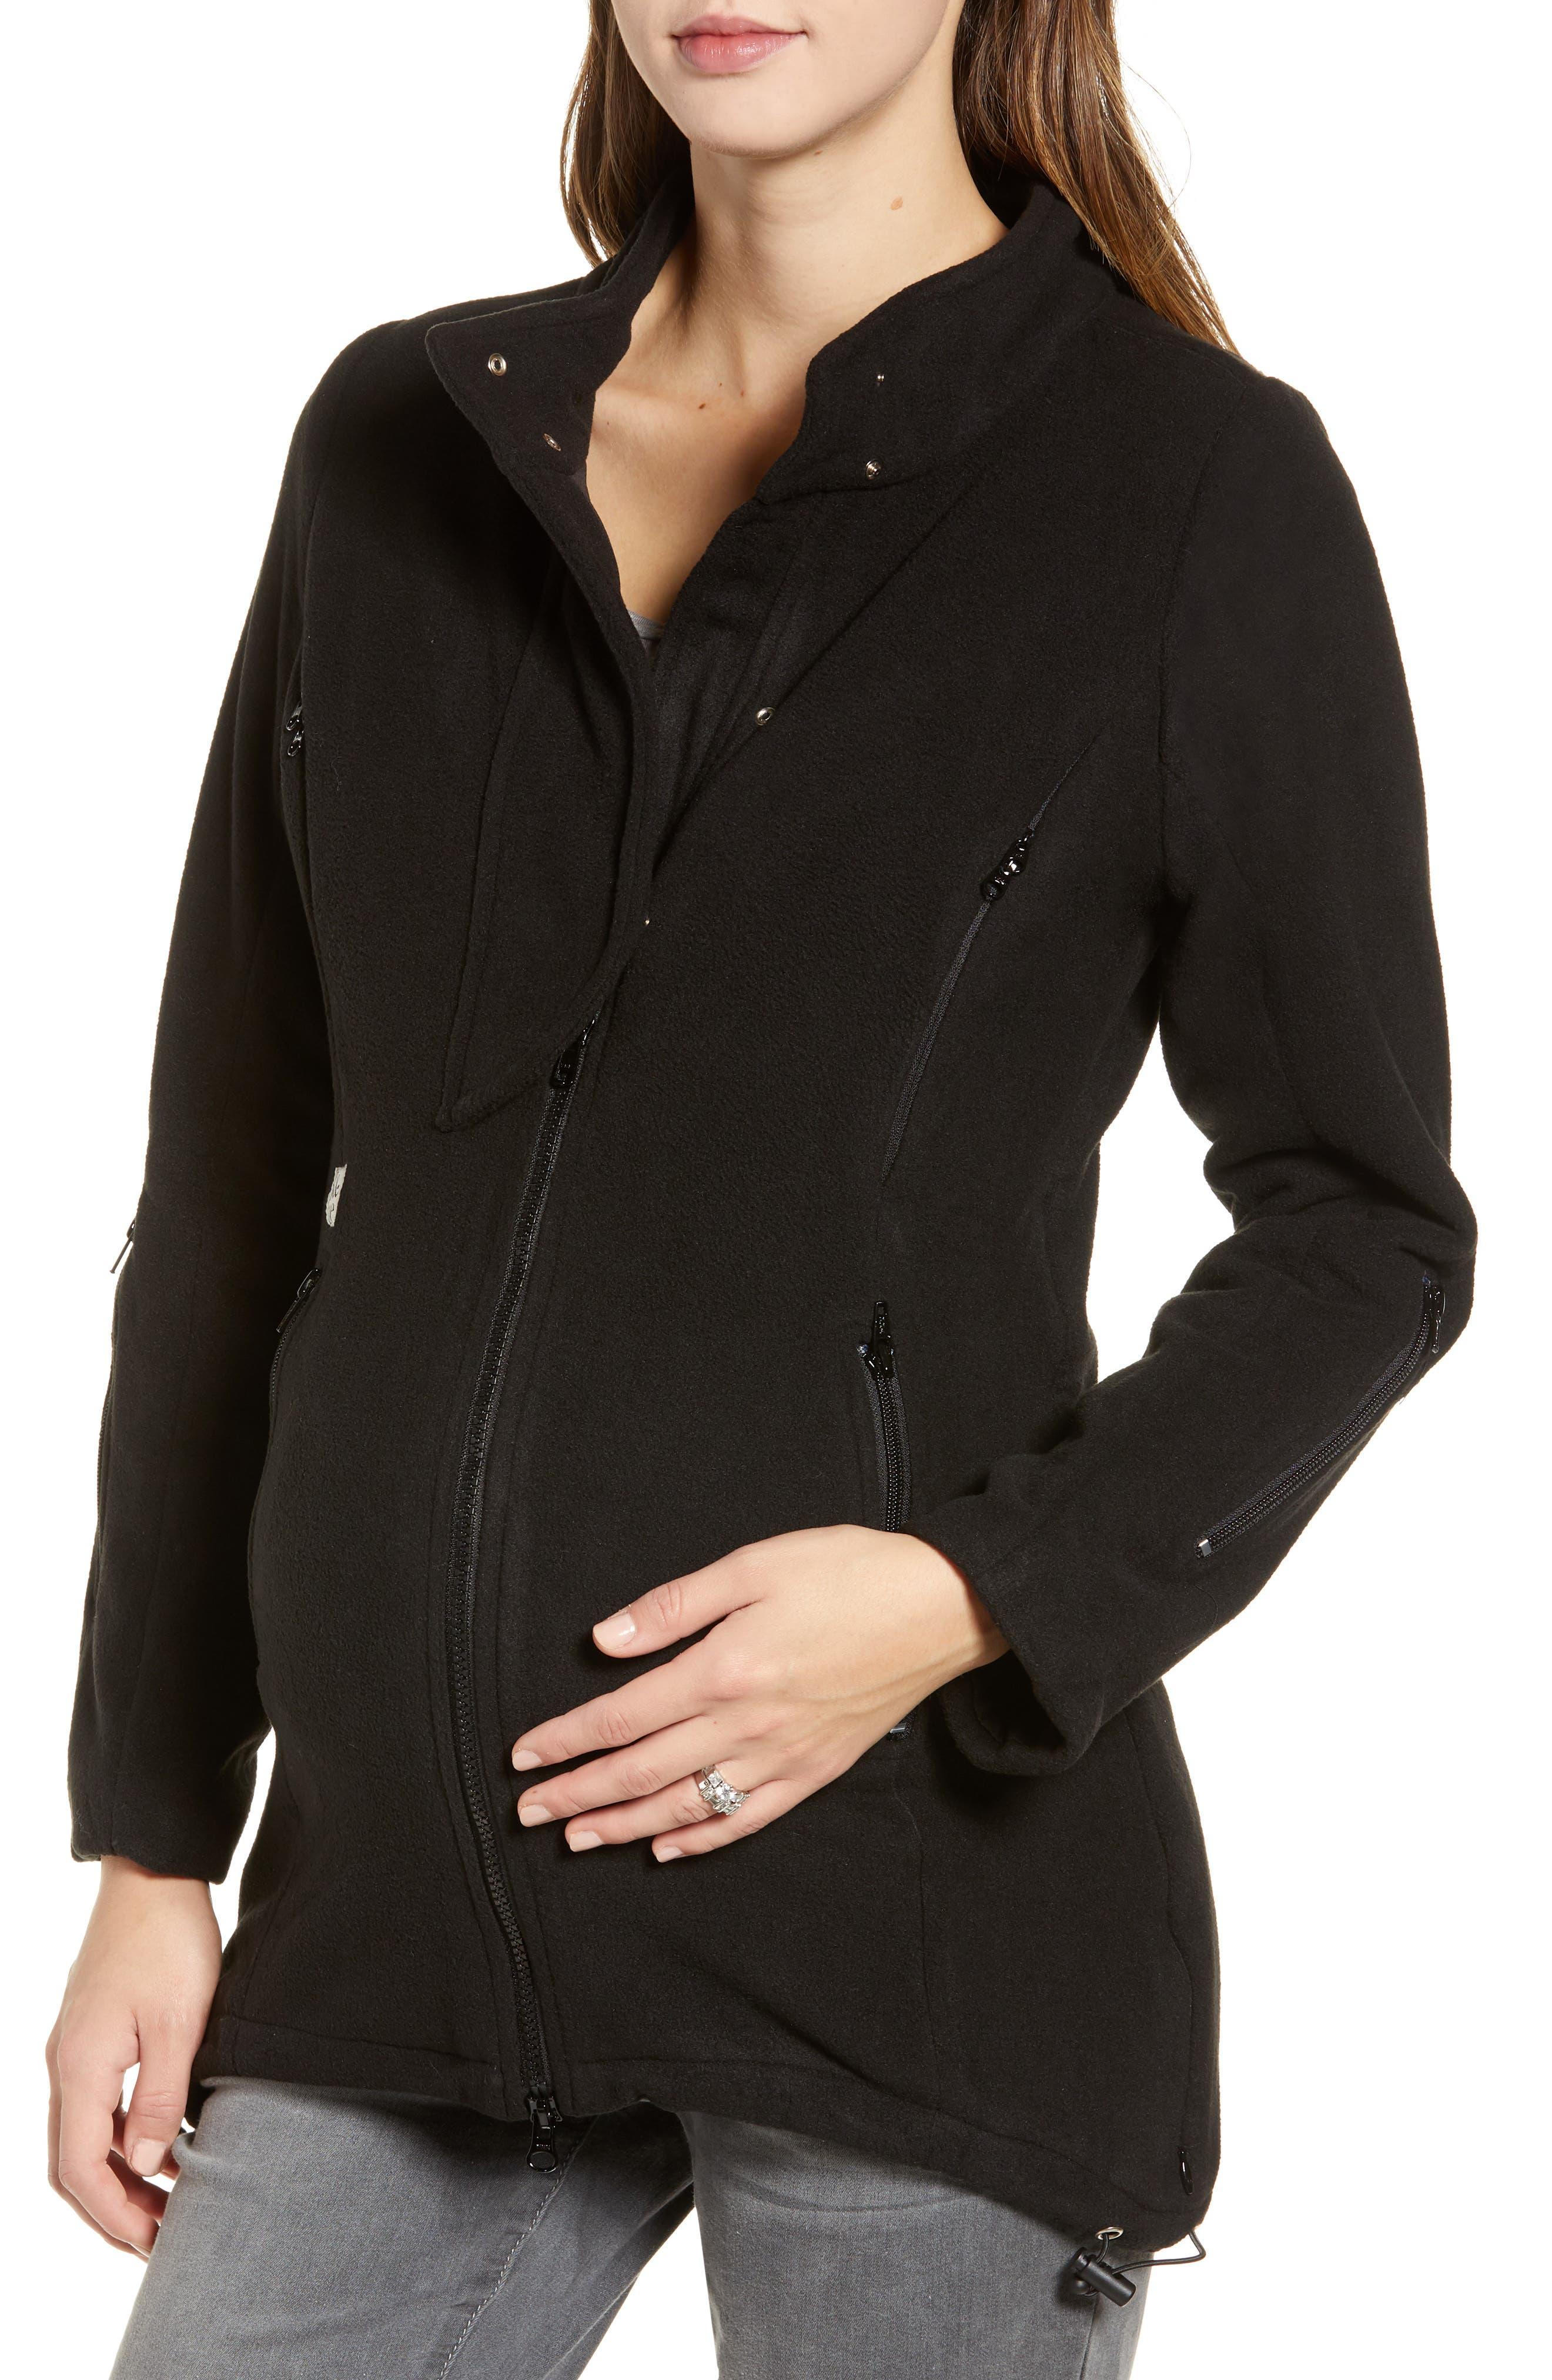 Booker Maternity Coat